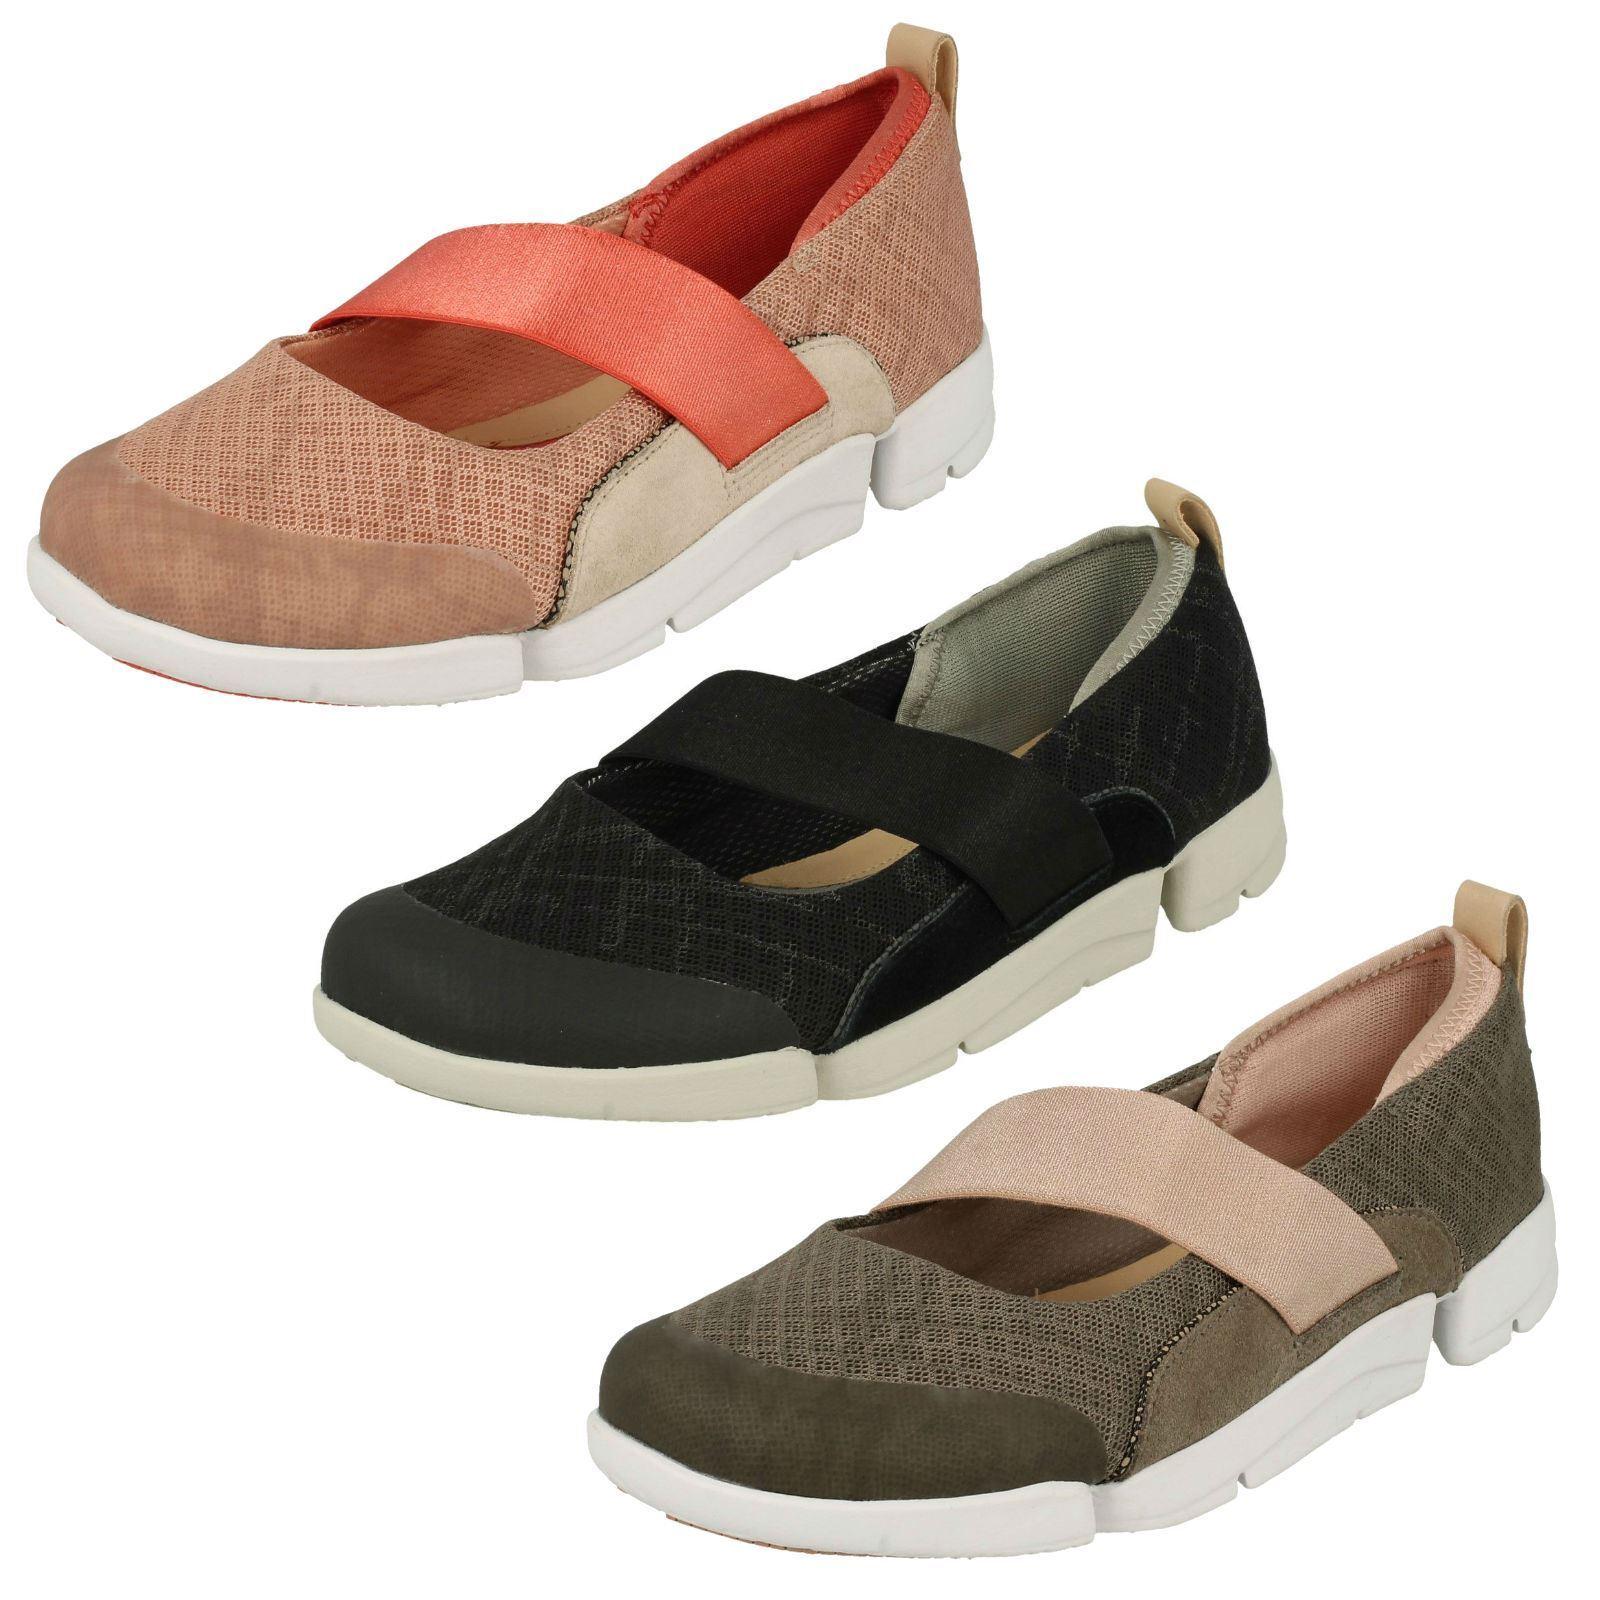 Femmes Clarks Casual Fashion Fashion Fashion Chaussures de sport Tri allie 80c425